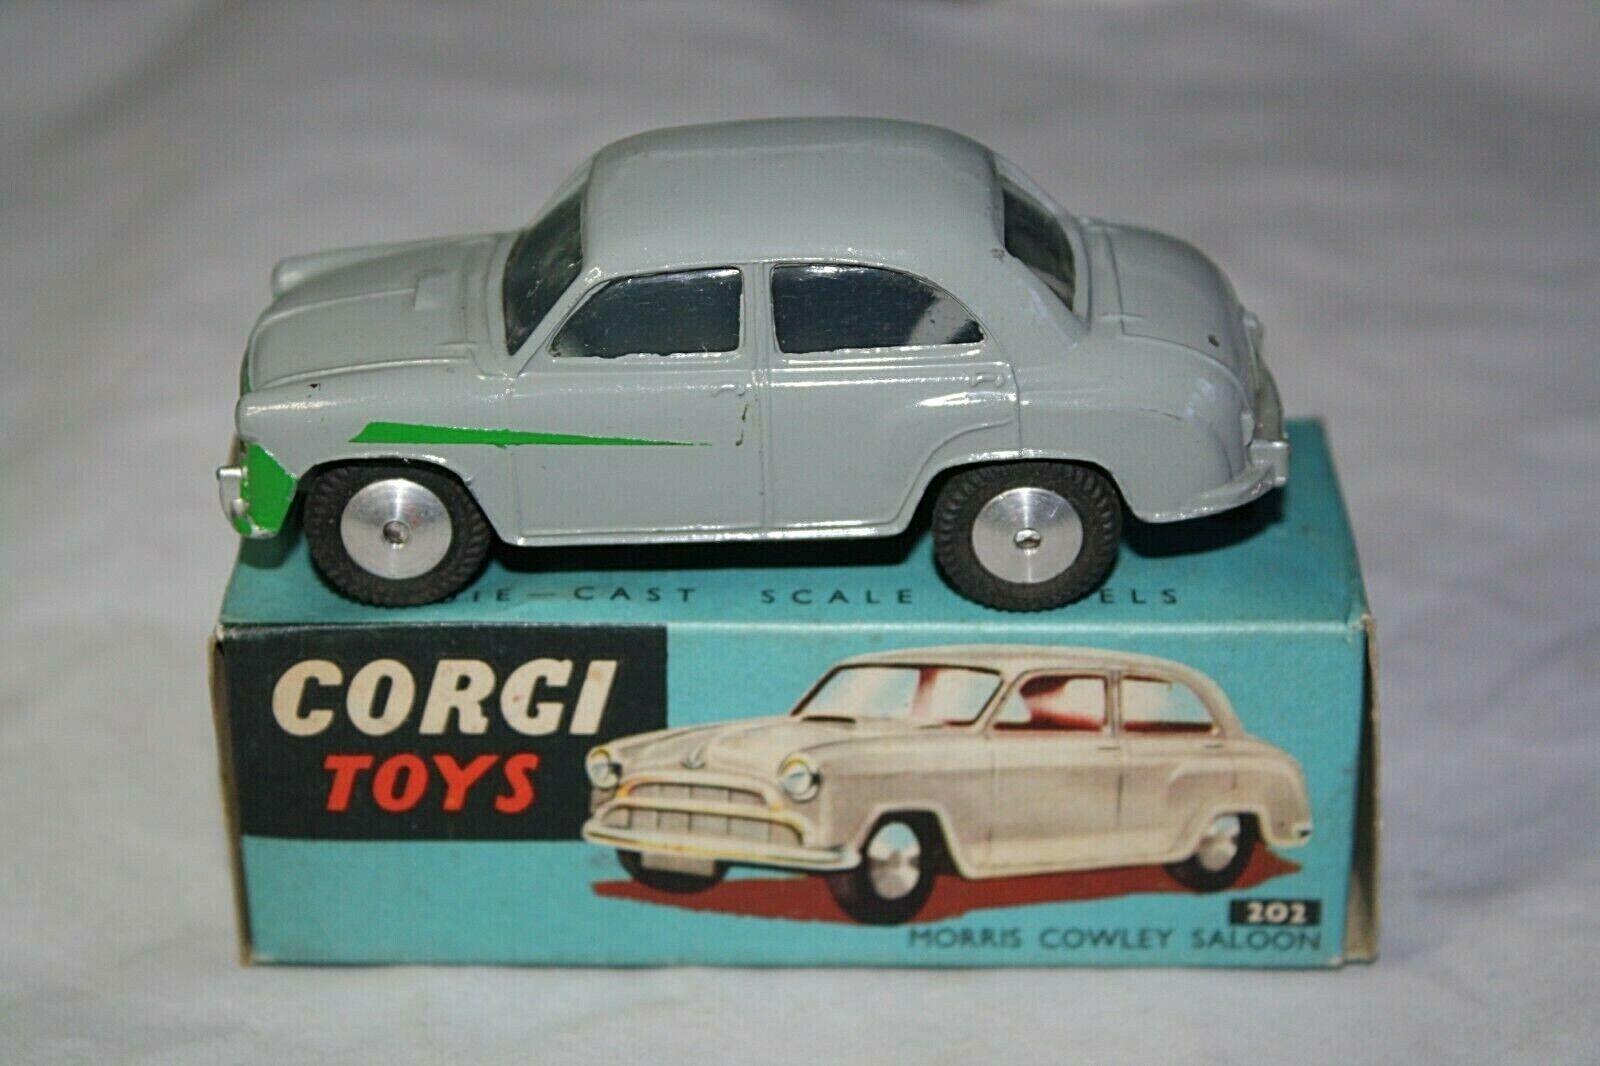 Corgi 202 Morris Cowley, Excellent Condition in Good Original Box